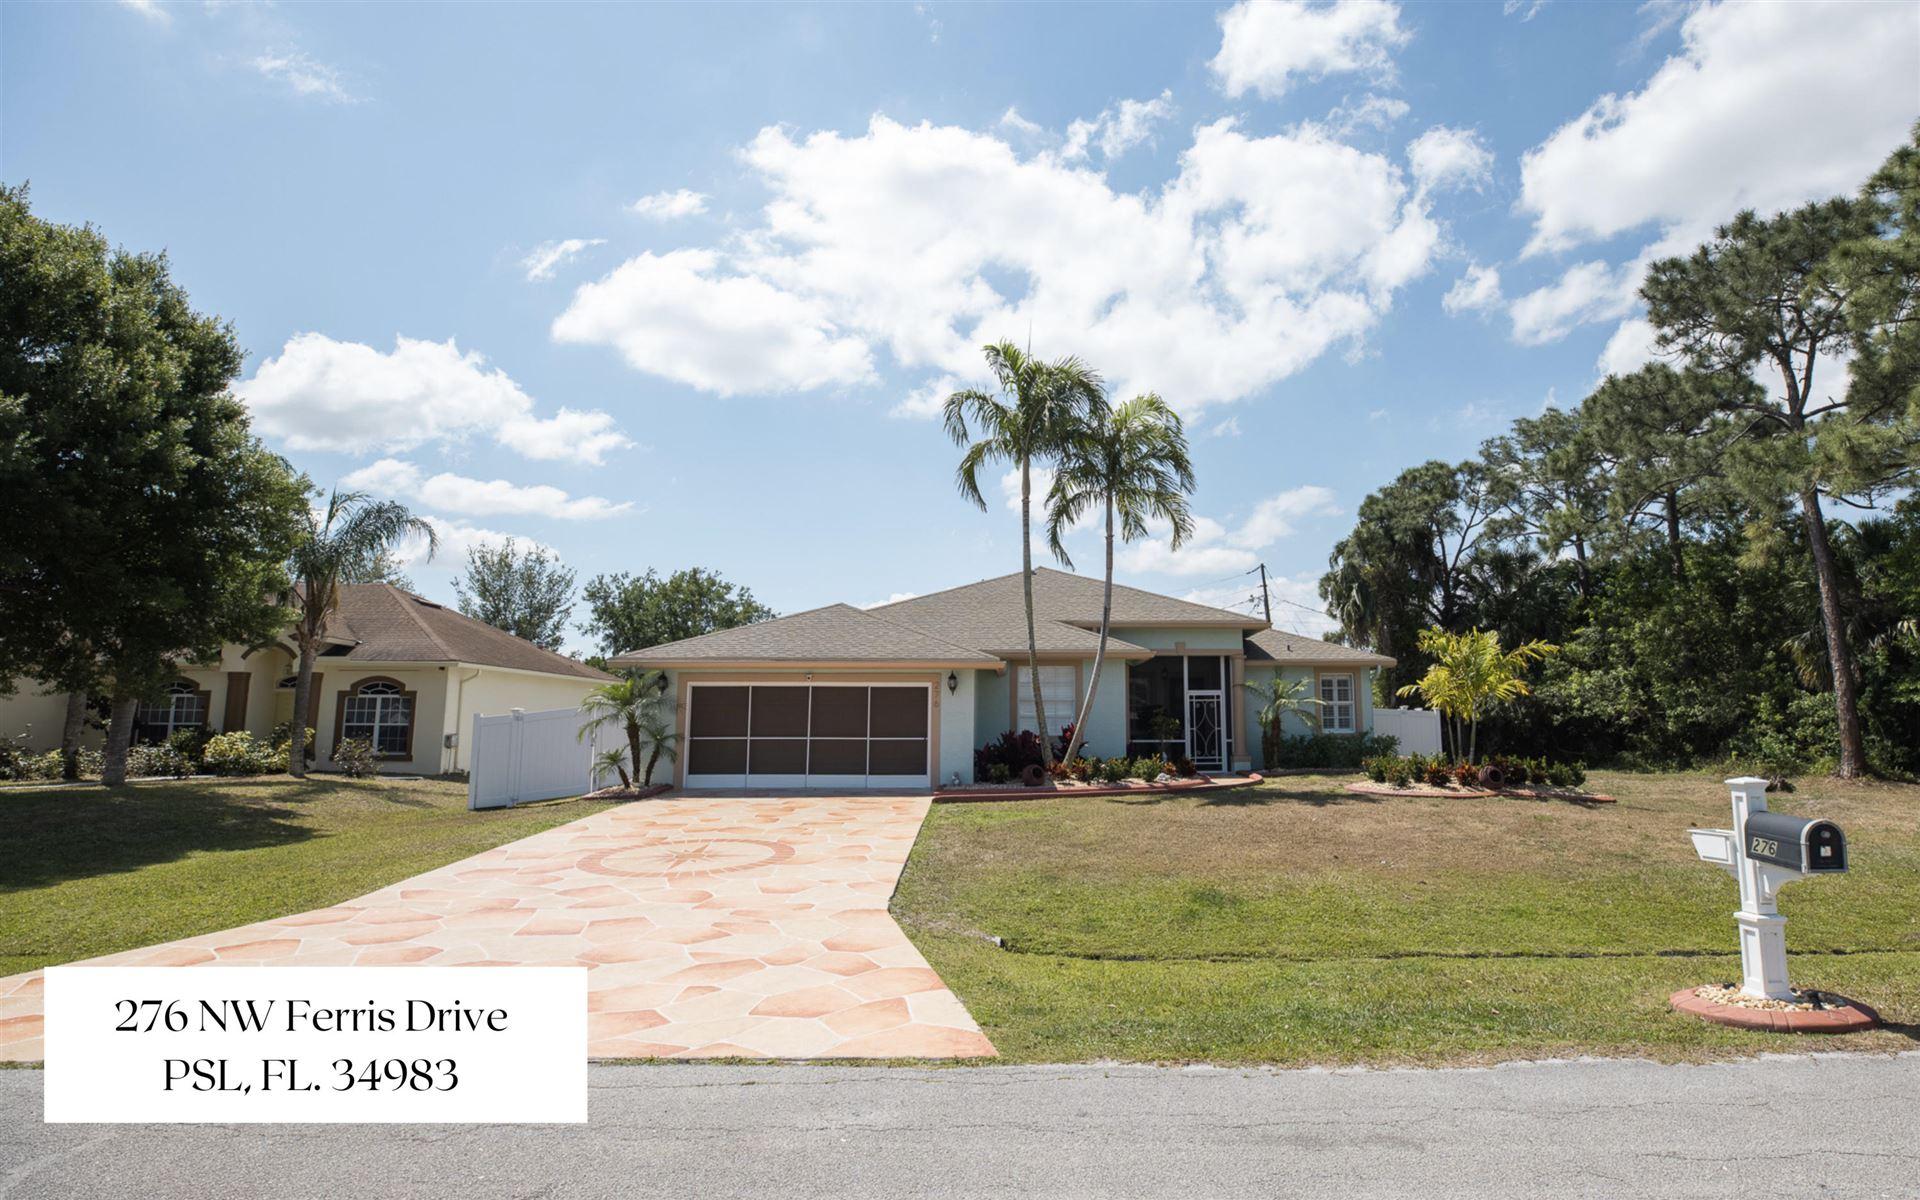 276 NW Ferris Drive, Port Saint Lucie, FL 34983 - #: RX-10706861